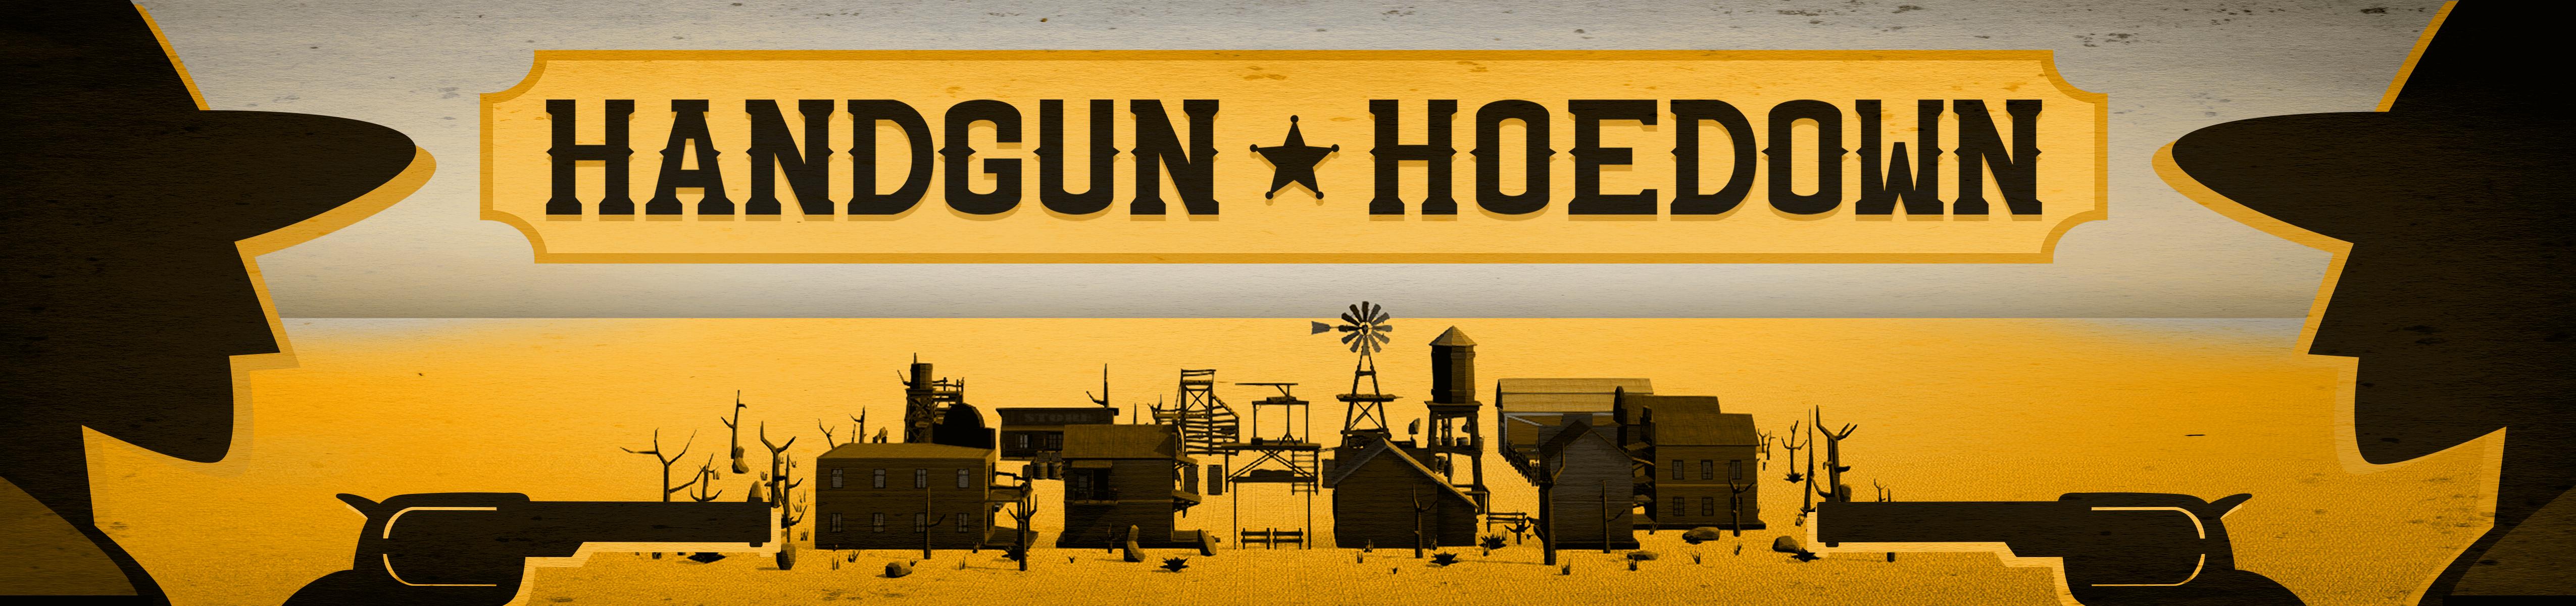 Handgun Hoedown